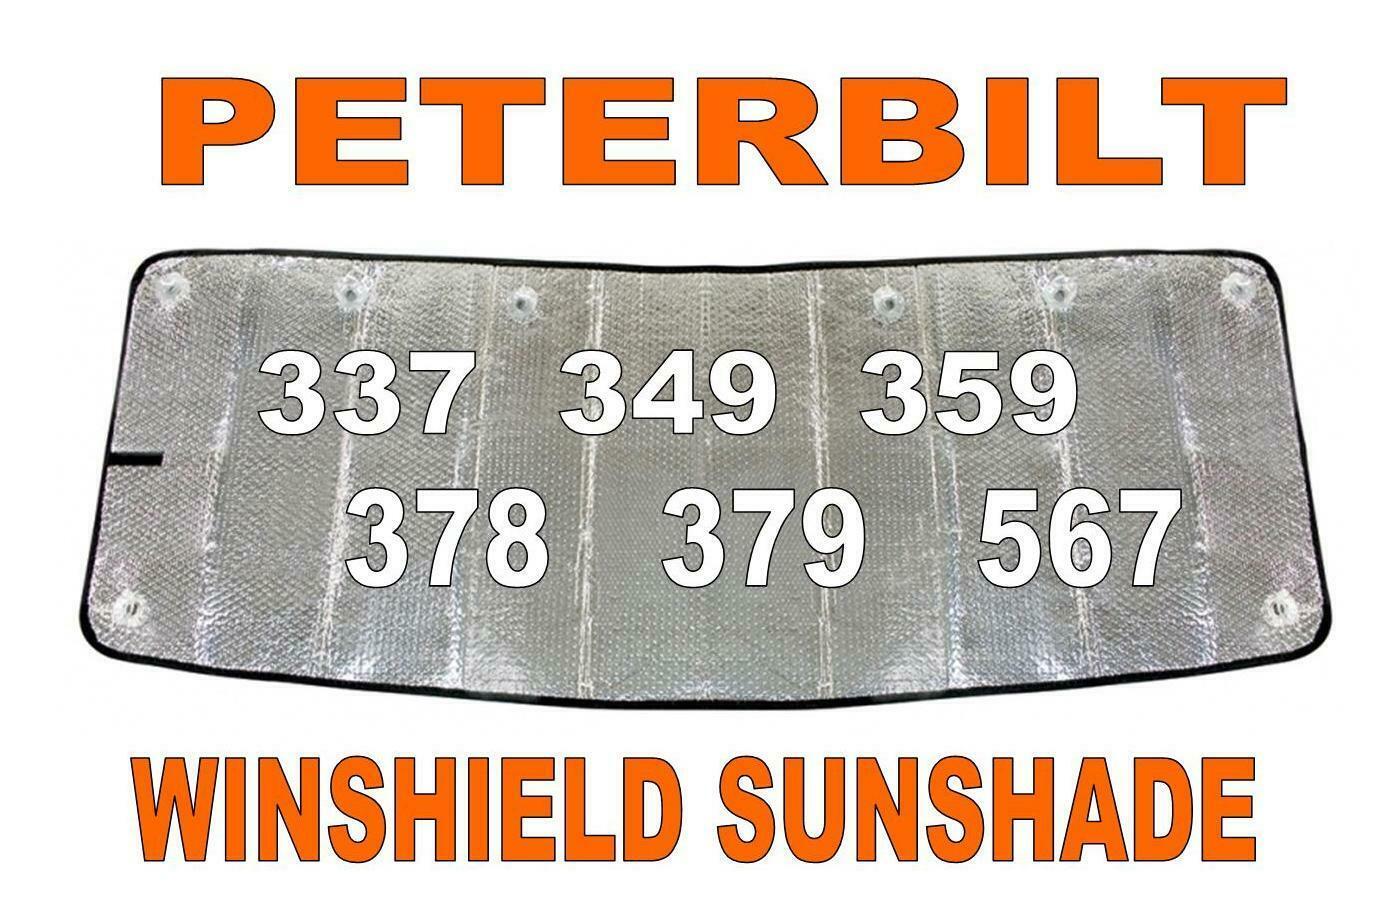 Windshield Sunshade For Peterbilt 379 (300 Series)  Trucks